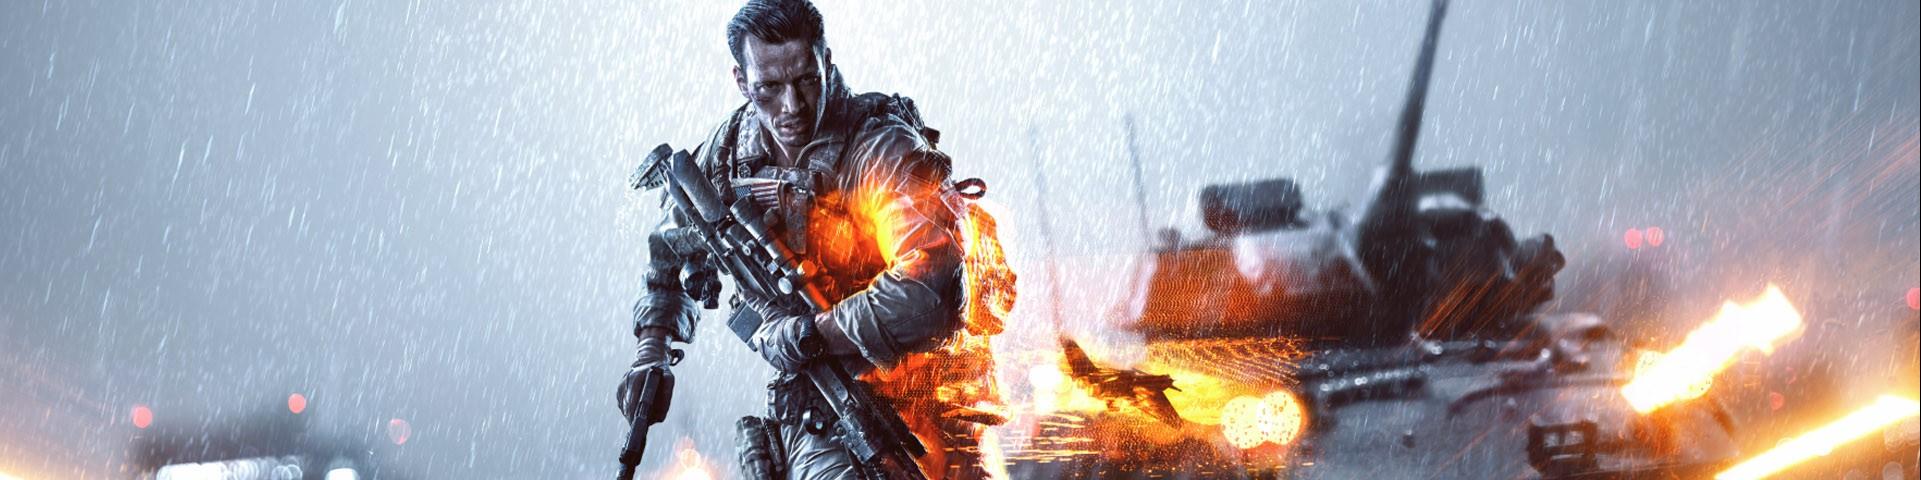 Battlefield 4™ for PC | Origin